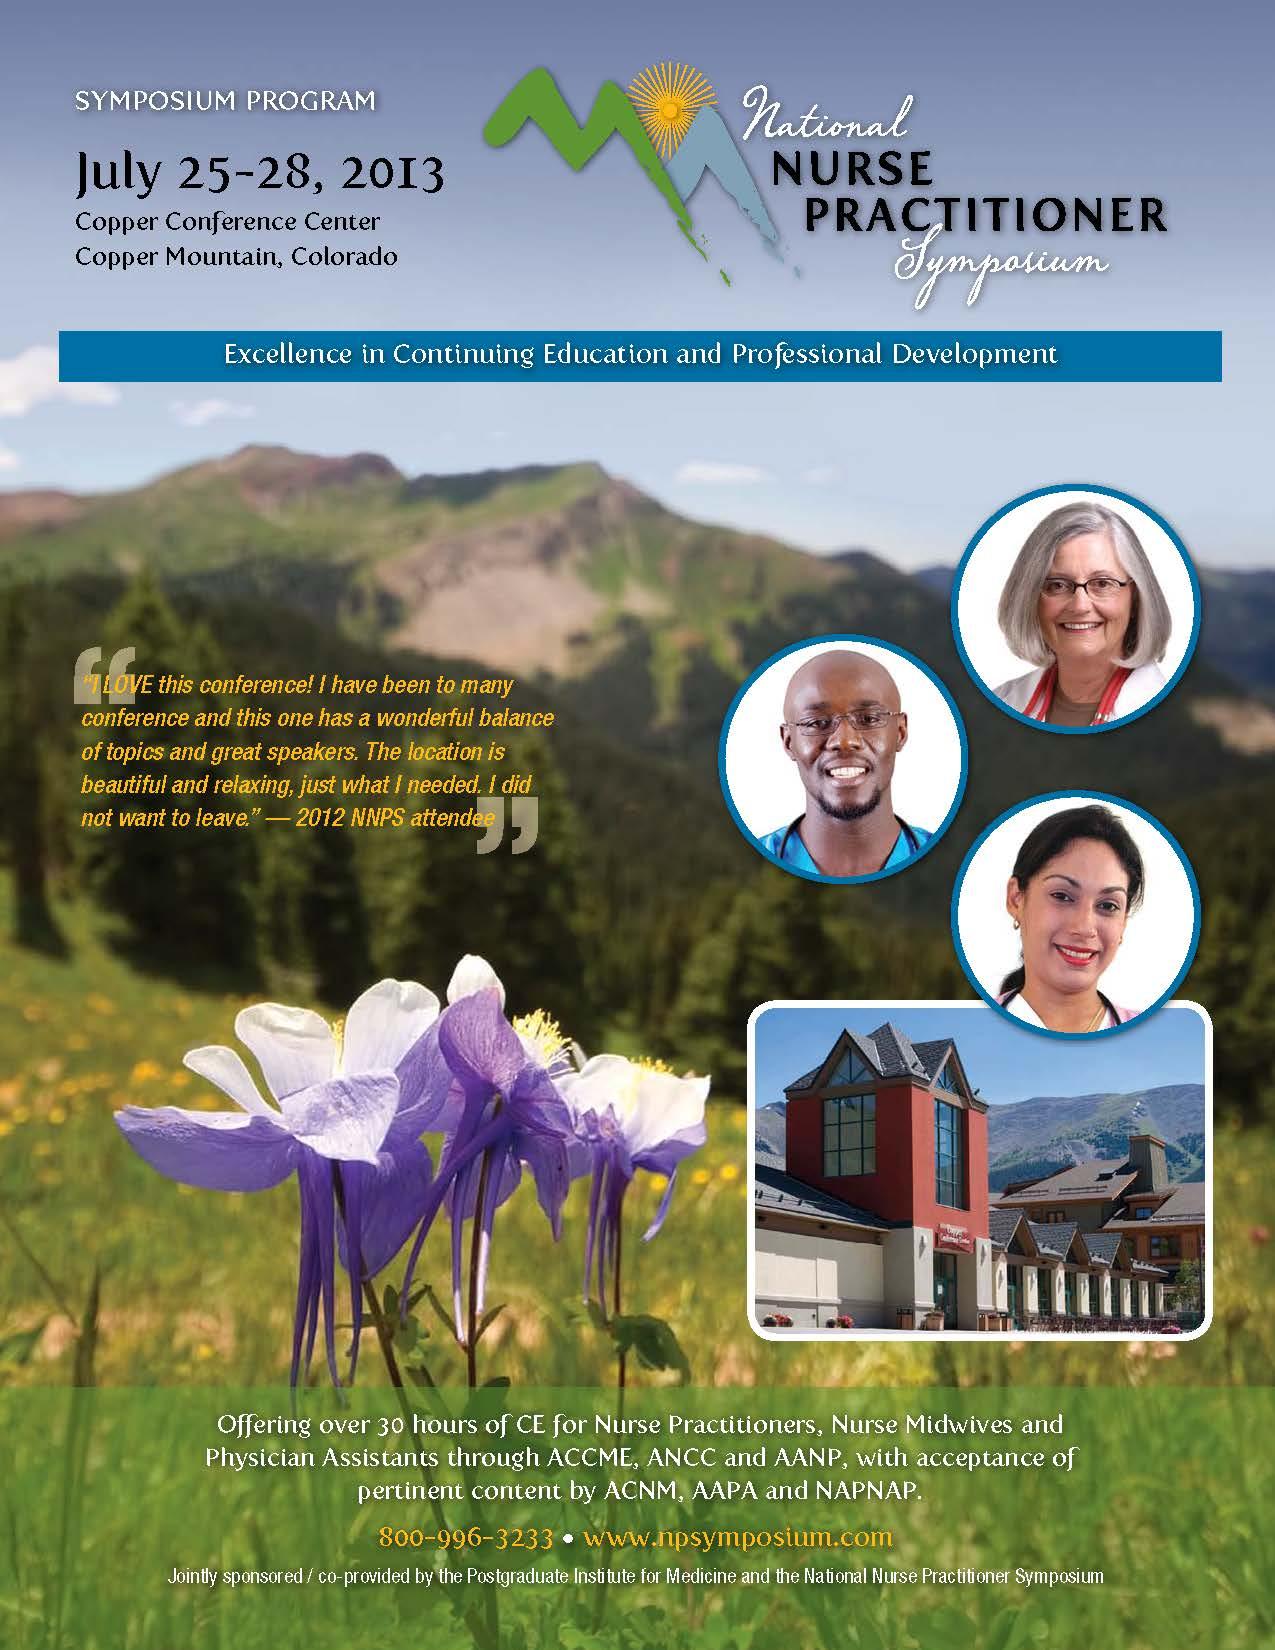 National Nurse Practitioner Symposium